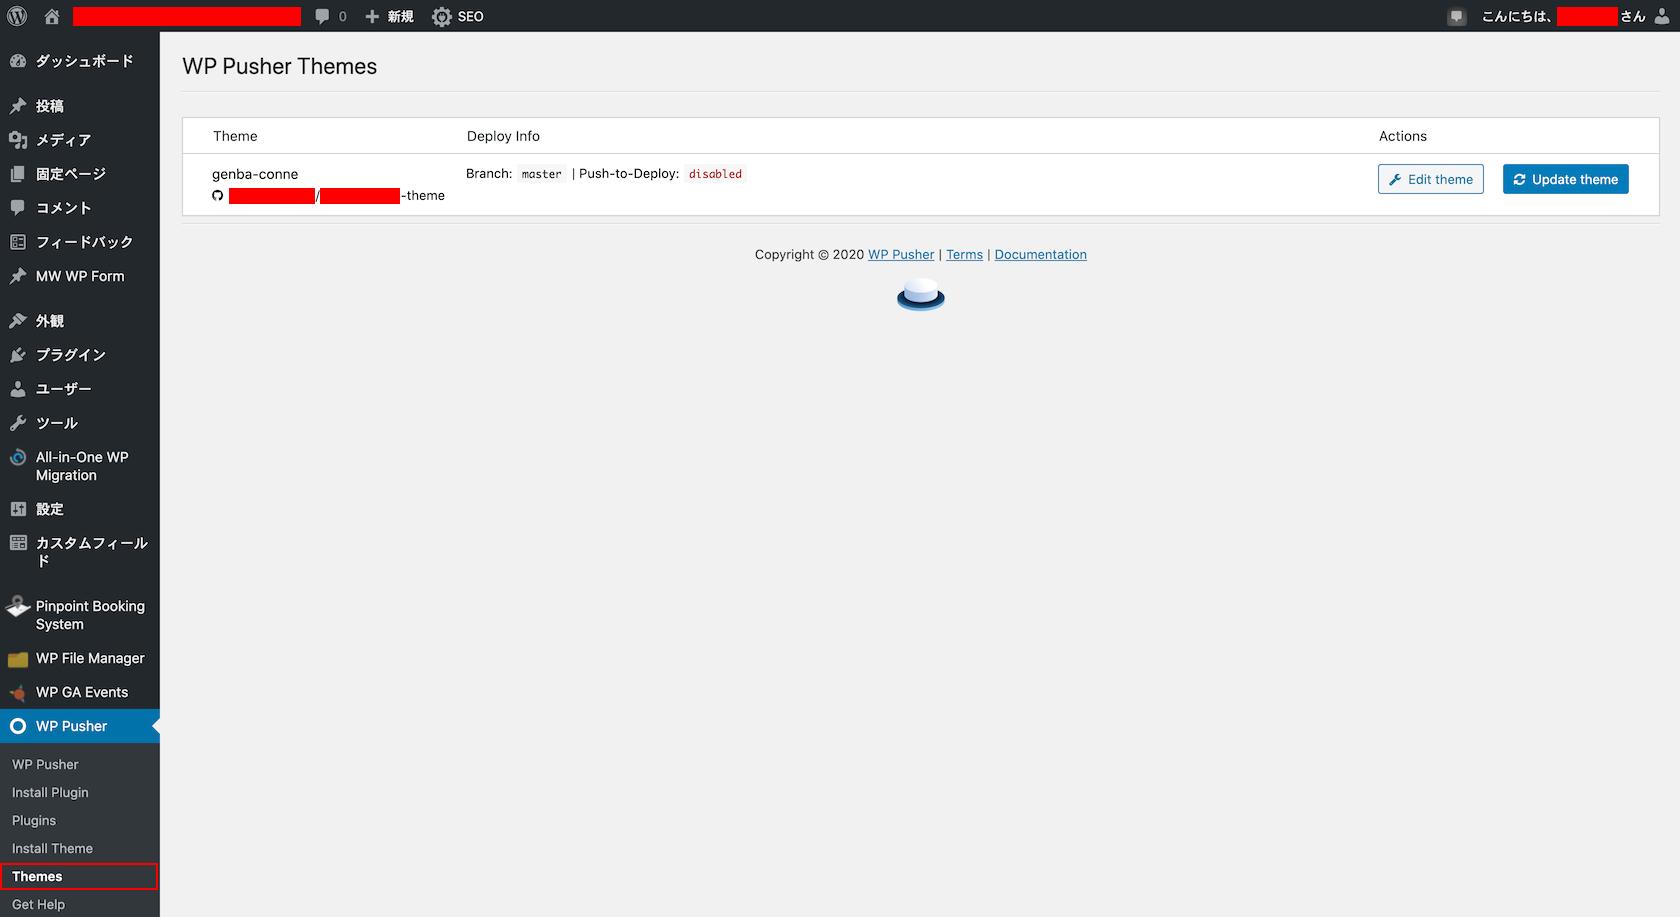 FireShot Capture 306 - WP Pusher Themes ‹ 【Shifter 検証用】現場クラウド Conne — WordPress_ - testgenbasupportcom.local.png